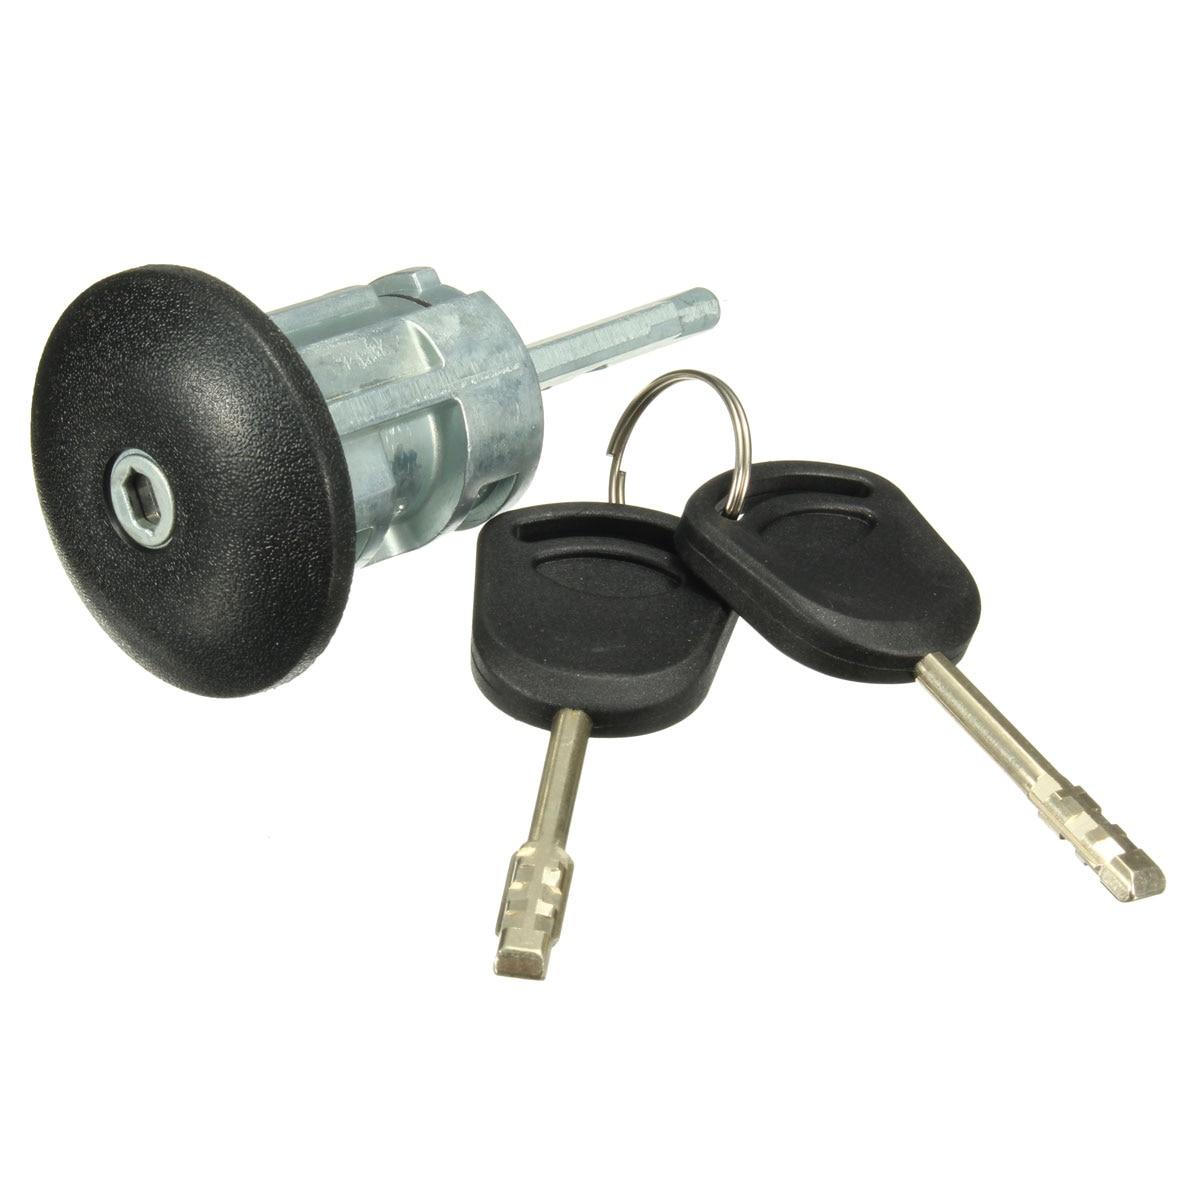 Front Right Driver Side Door Lock Barrel & 2 Keys 4060638 for Ford Transit MK6 2000 2001 2002 2003 2004 2005 2006